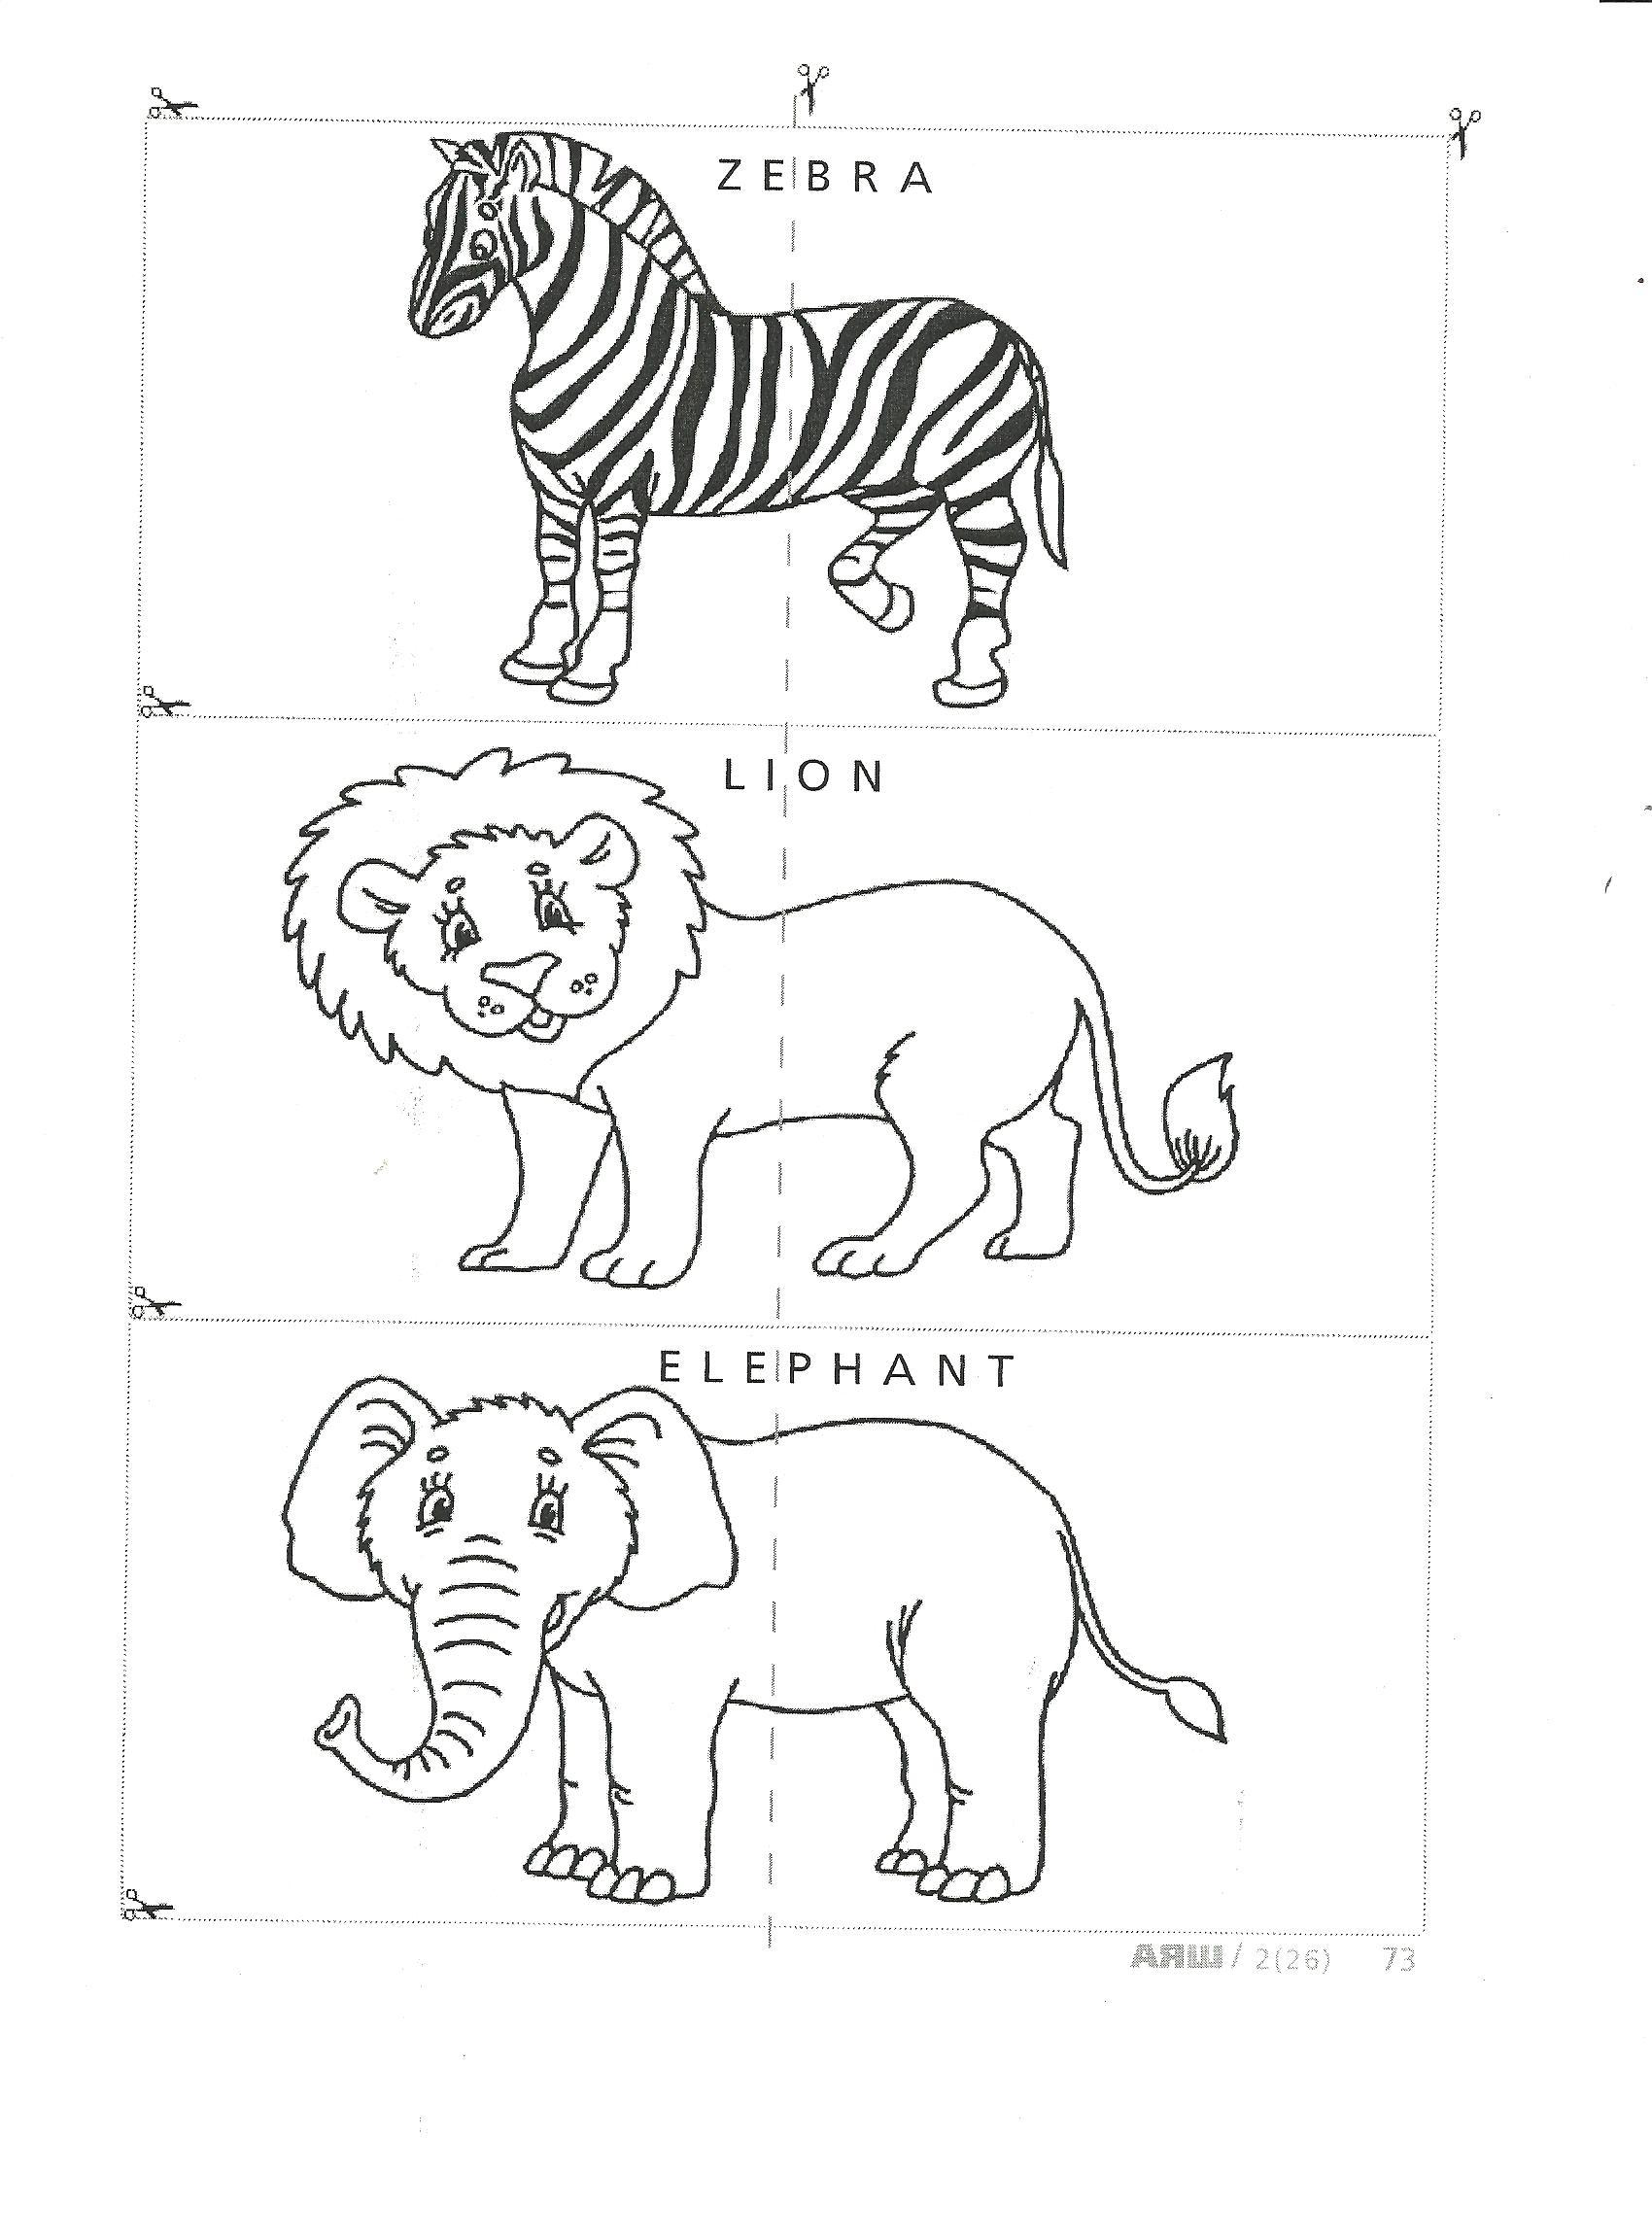 G:\Урок английского языка Животные Сафари Парка 3 класс УМК Millie учитель Штурмина ОС шк№18\Приложение1.jpg